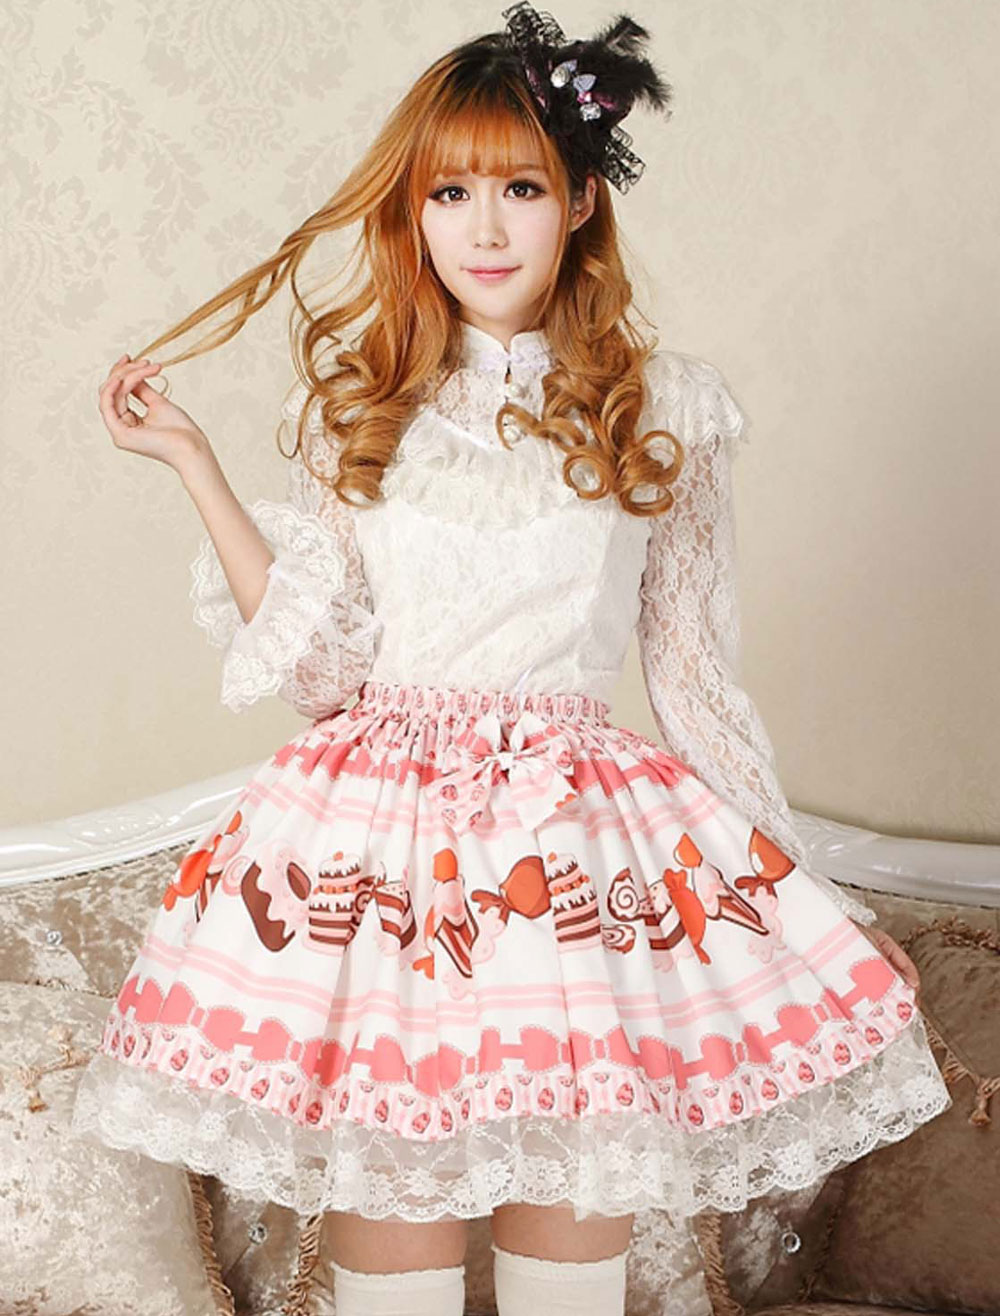 Buy Sweet Pink Lolita Short Skirt Cake Ice Cream Print Lace Trim for $30.59 in Milanoo store